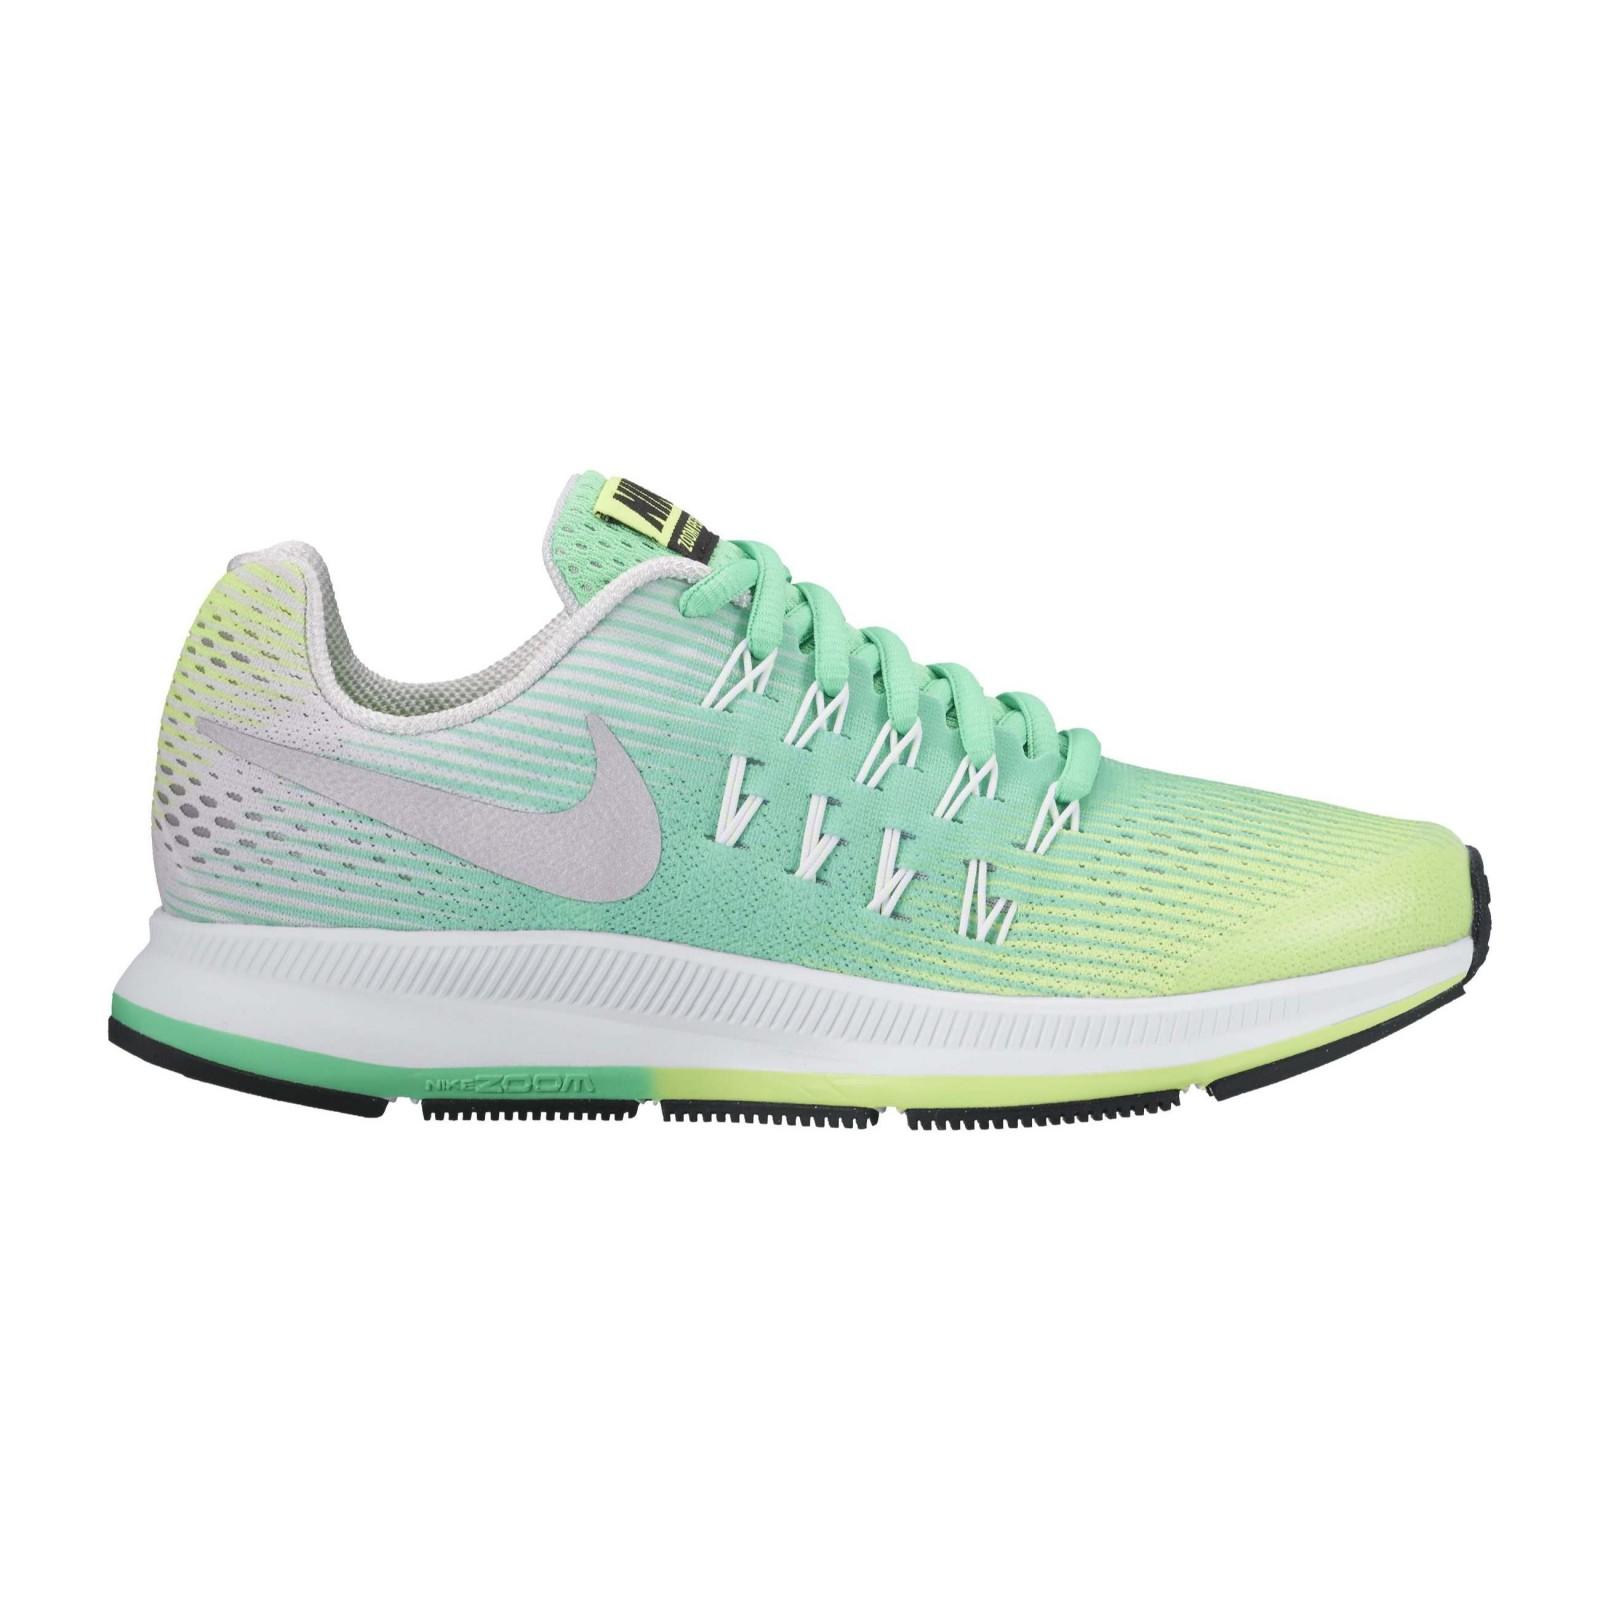 2b10980f35b Dětské běžecké boty Nike ZOOM PEGASUS 33 (GS)